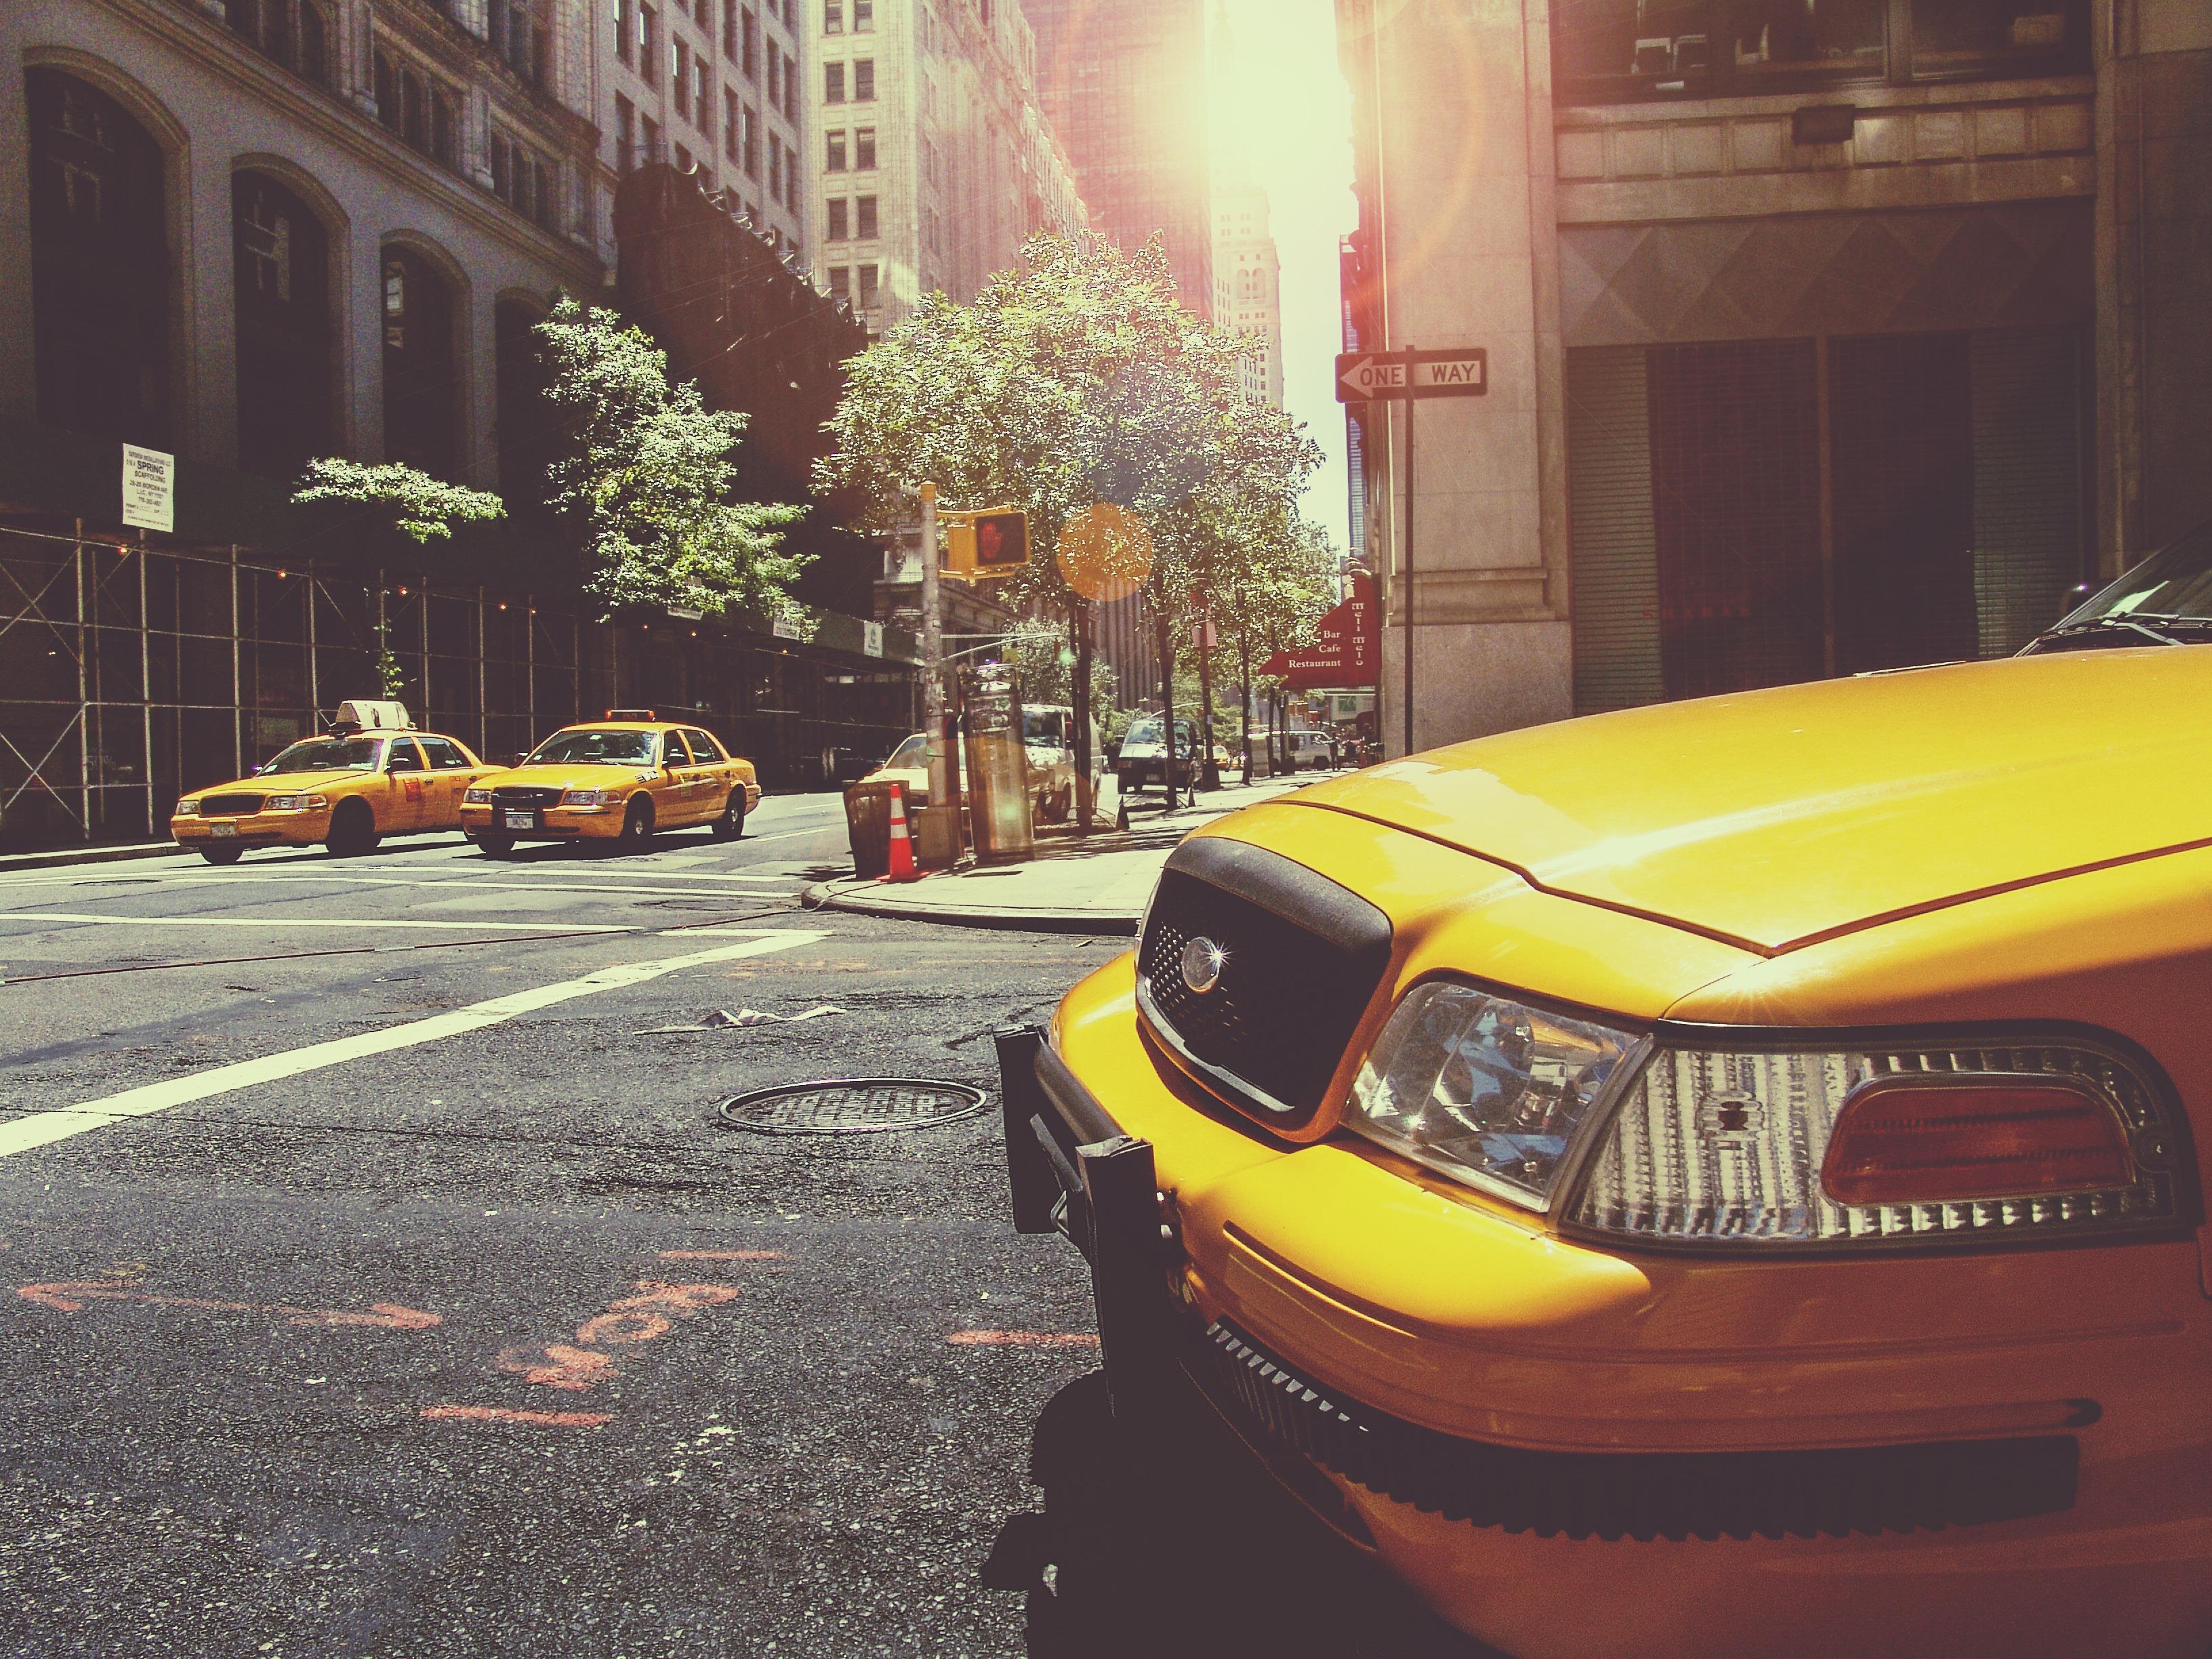 Free Images : pedestrian, road, traffic, street, car